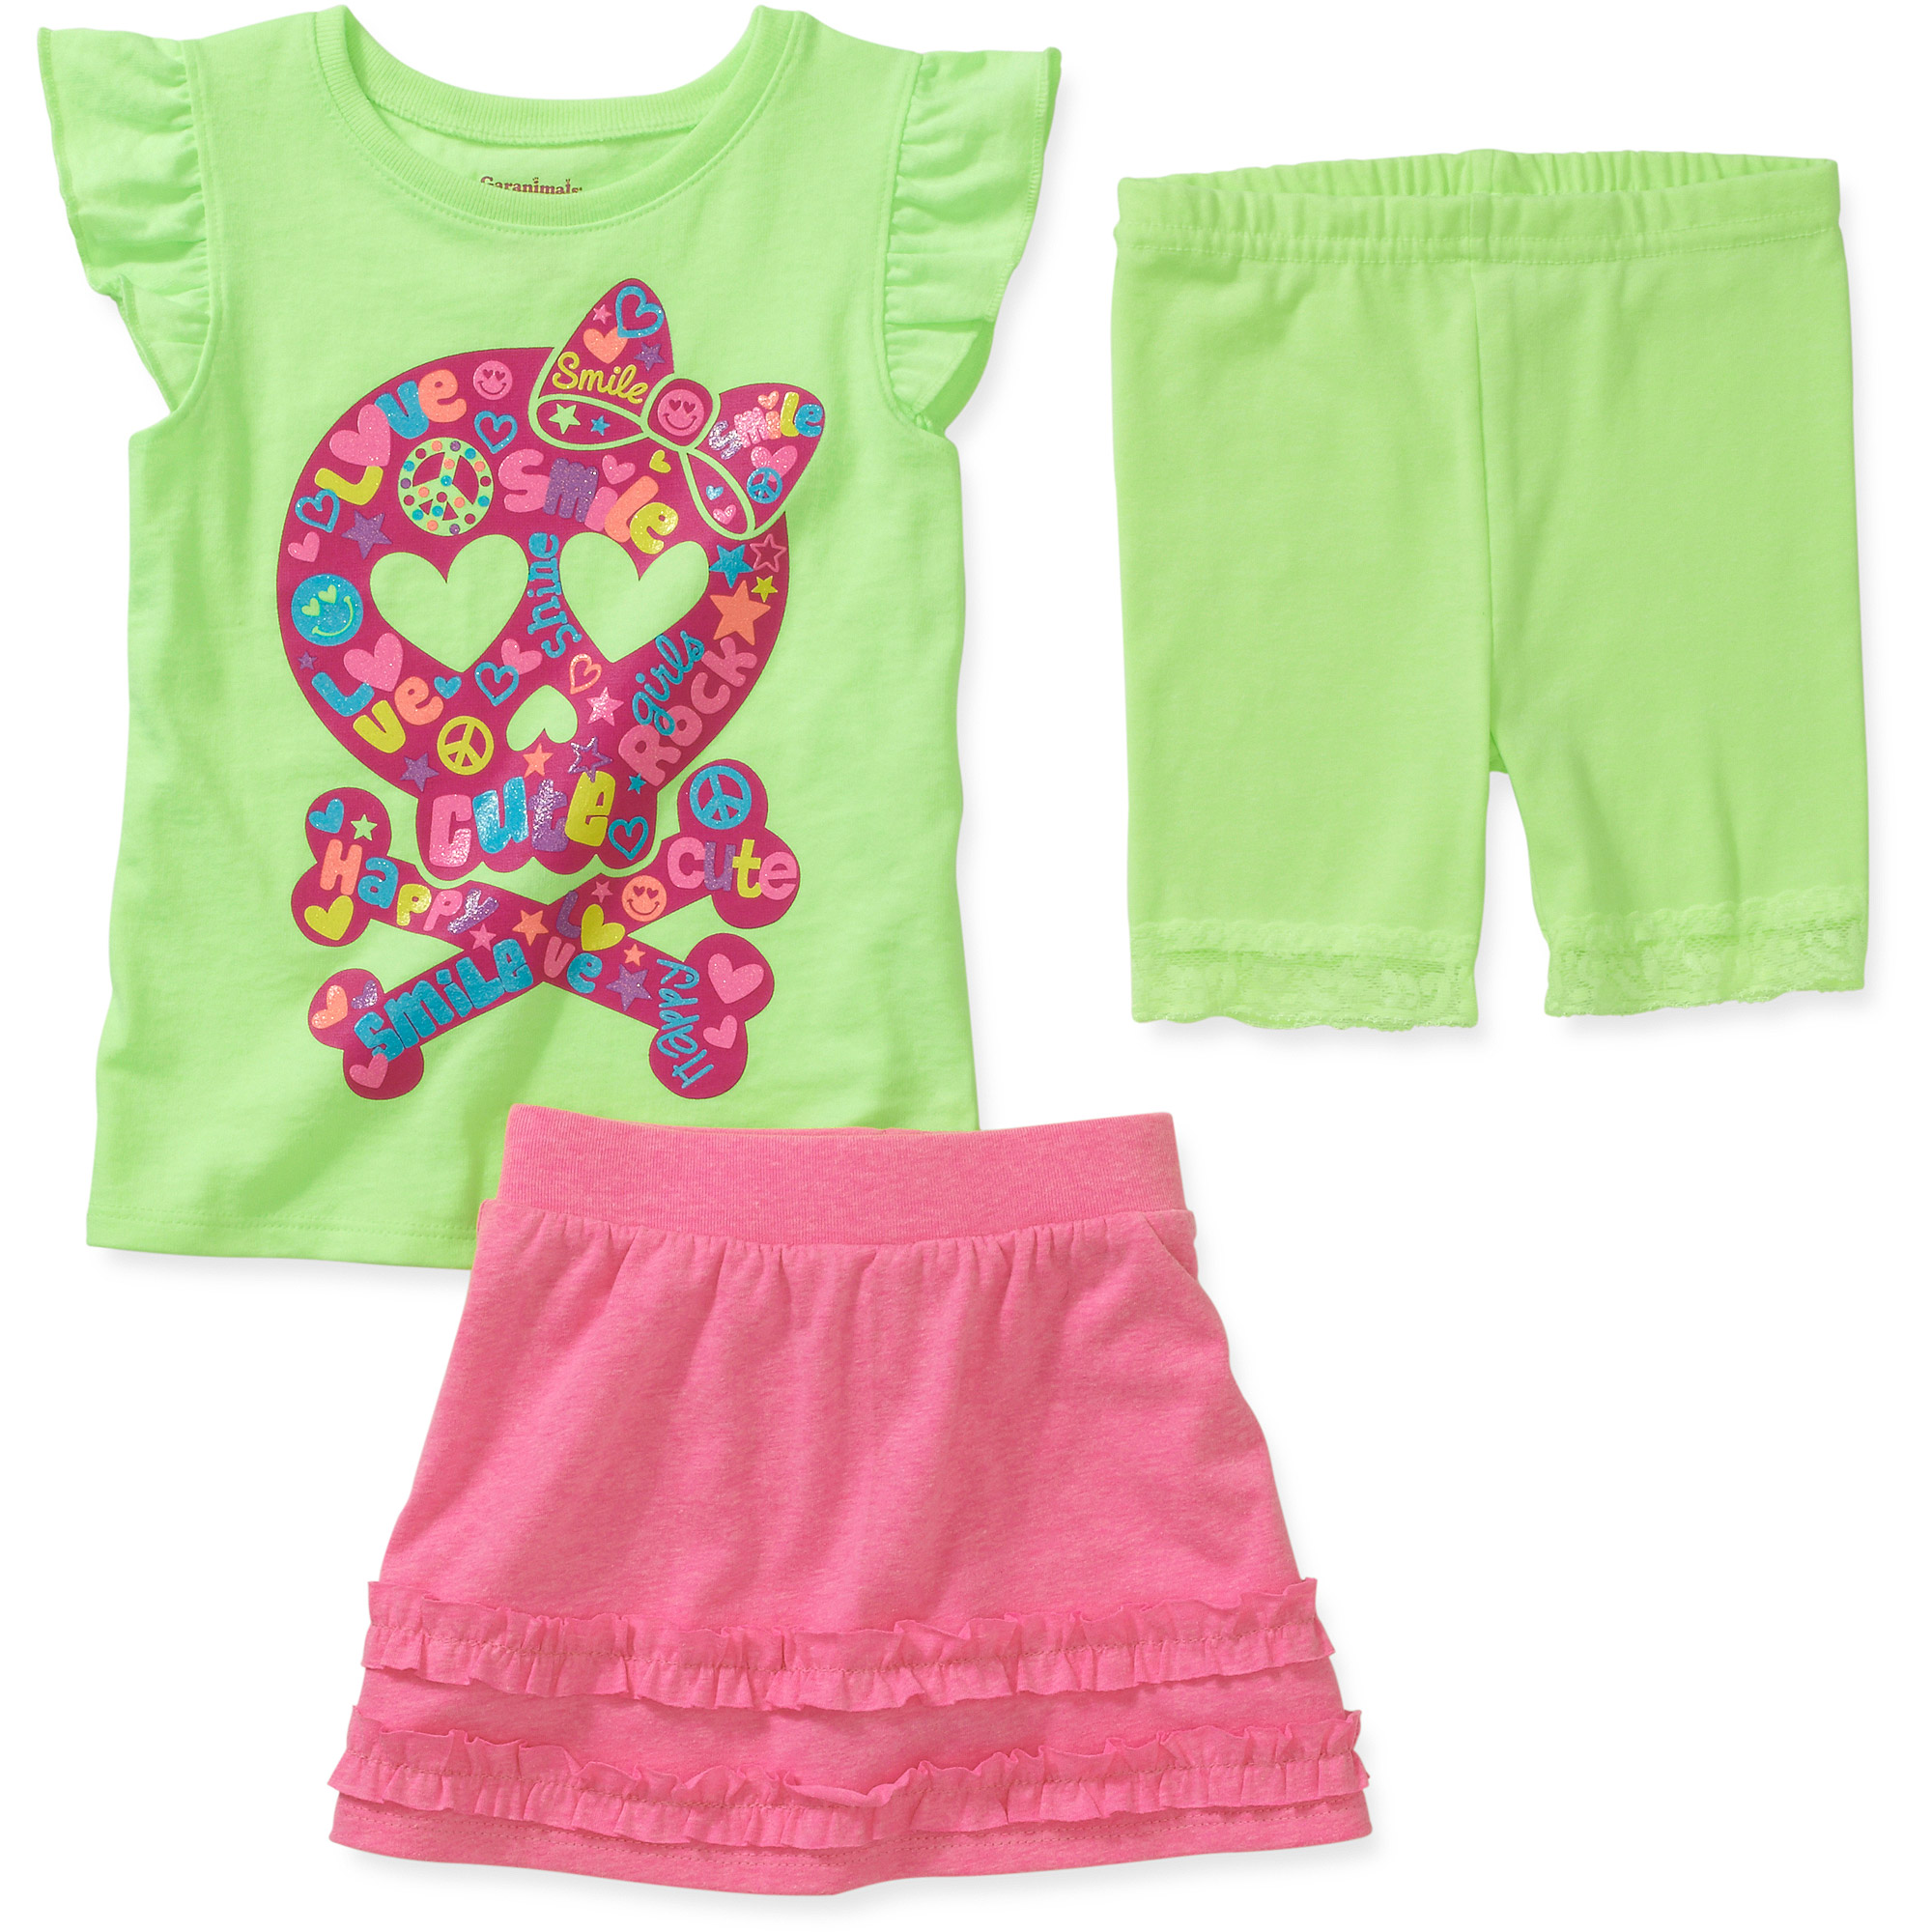 Garanimals Baby Toddler Girl 3-Piece Tee, Skort, and Bike Shorts Set